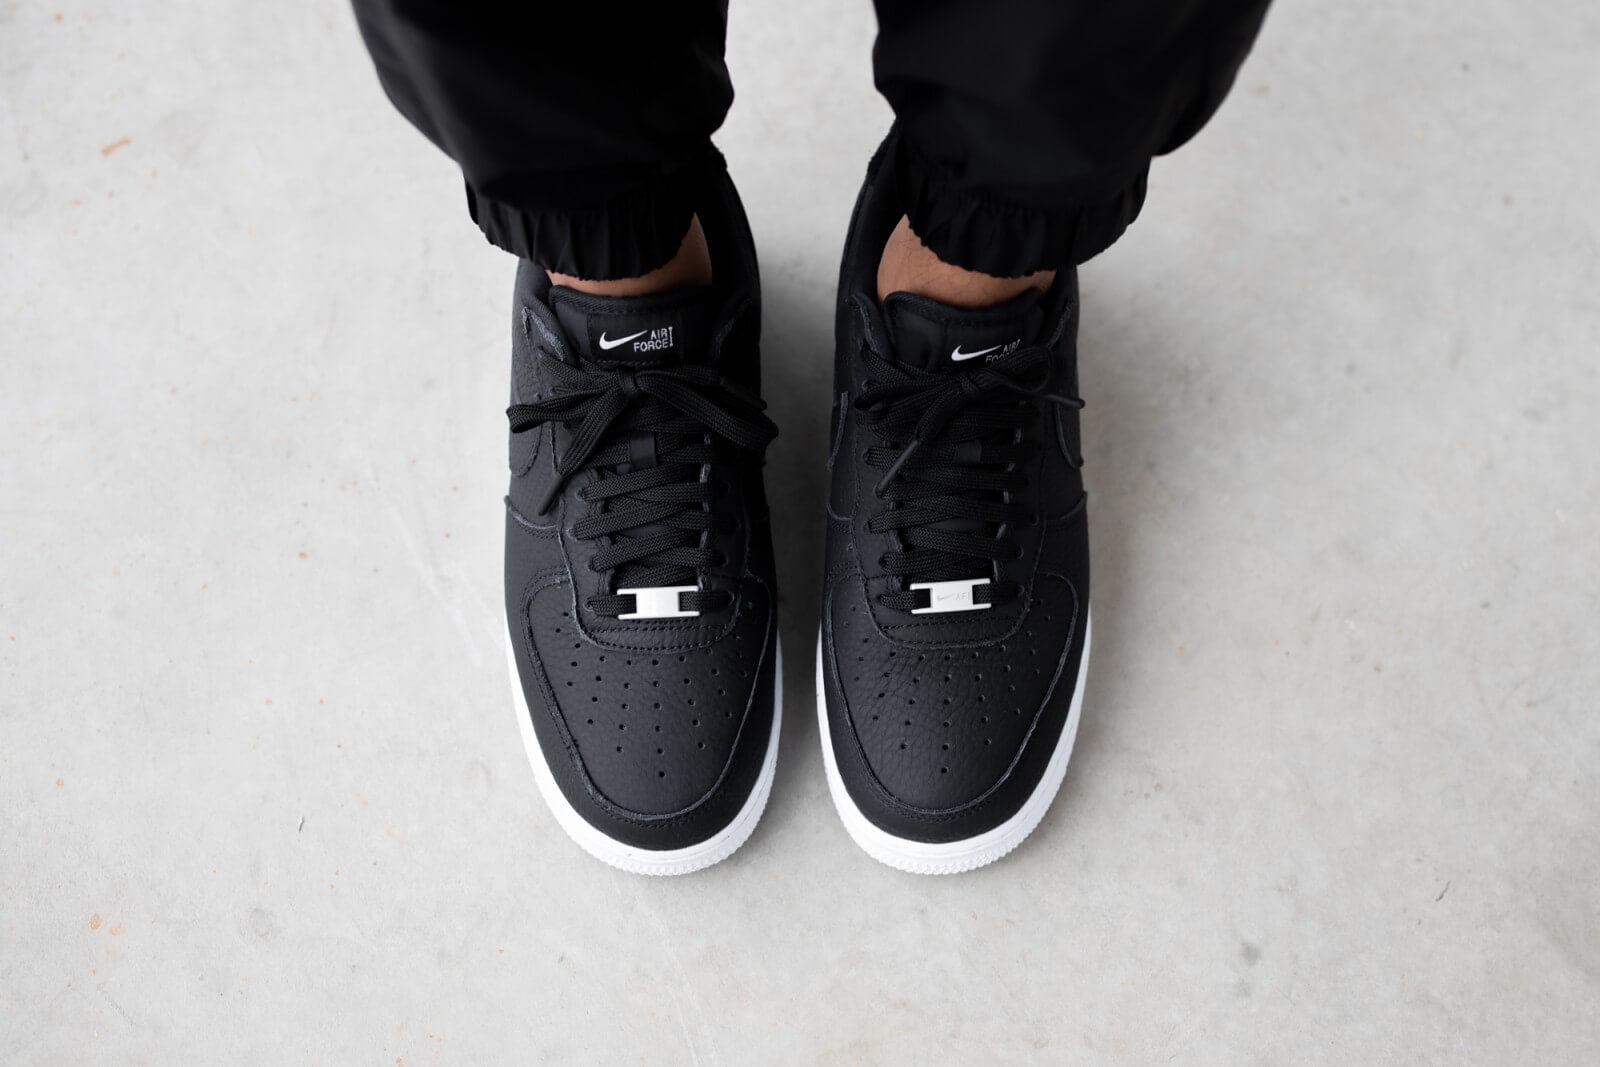 Nike Air Force 1 '07 Craft Black/White-Vast Grey